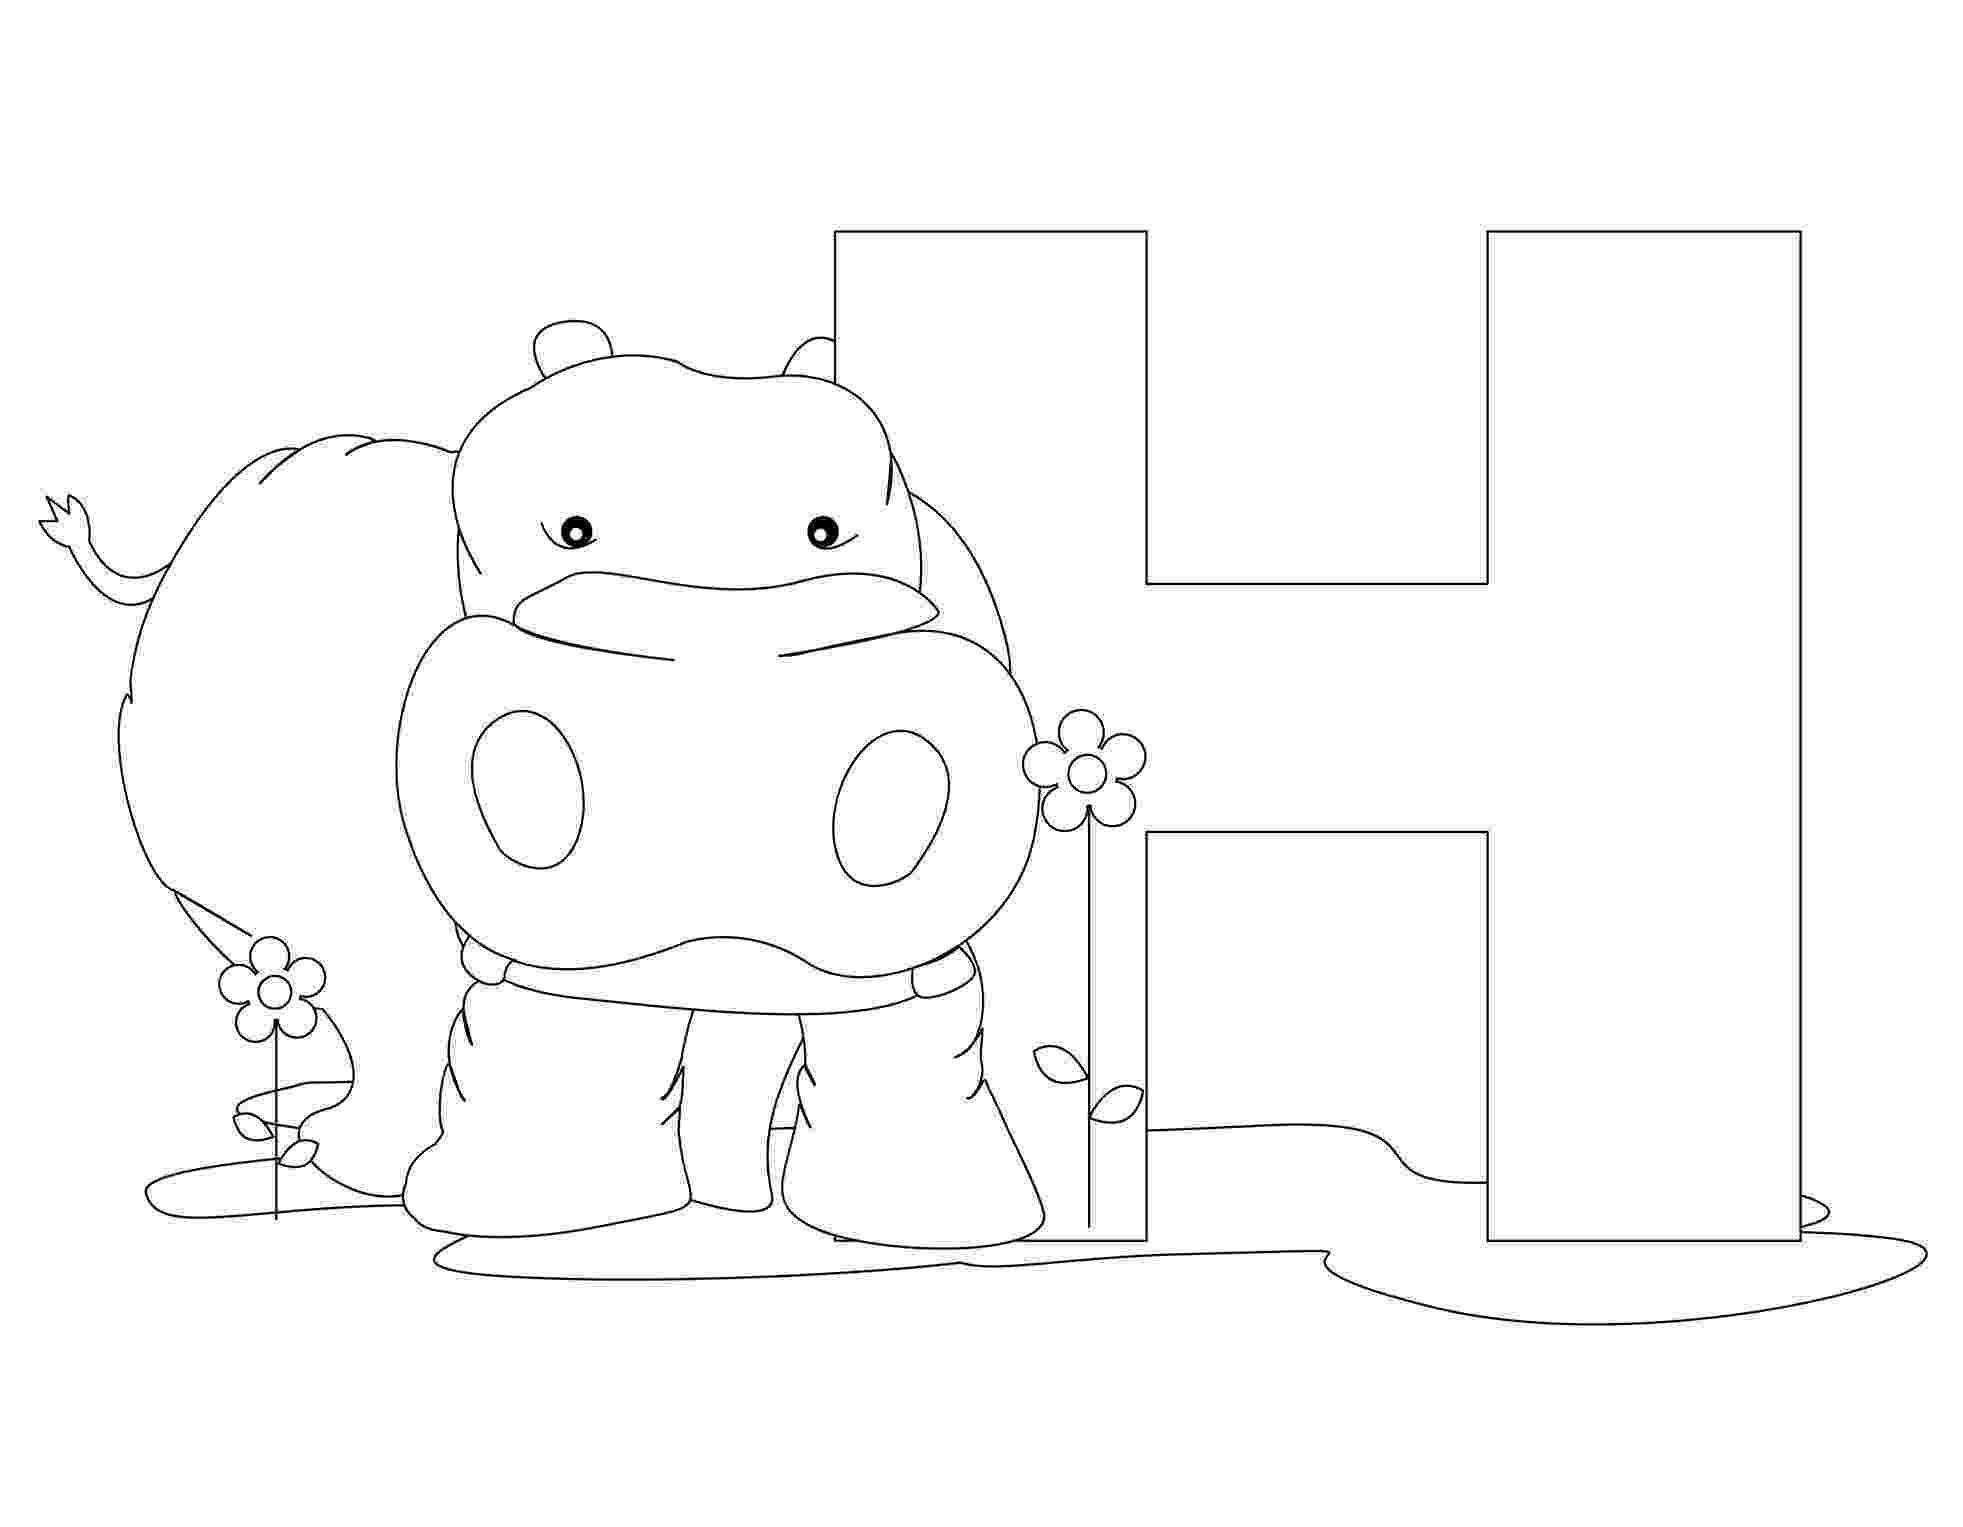 coloring animal alphabet free printable alphabet coloring pages for kids best alphabet coloring animal 1 1